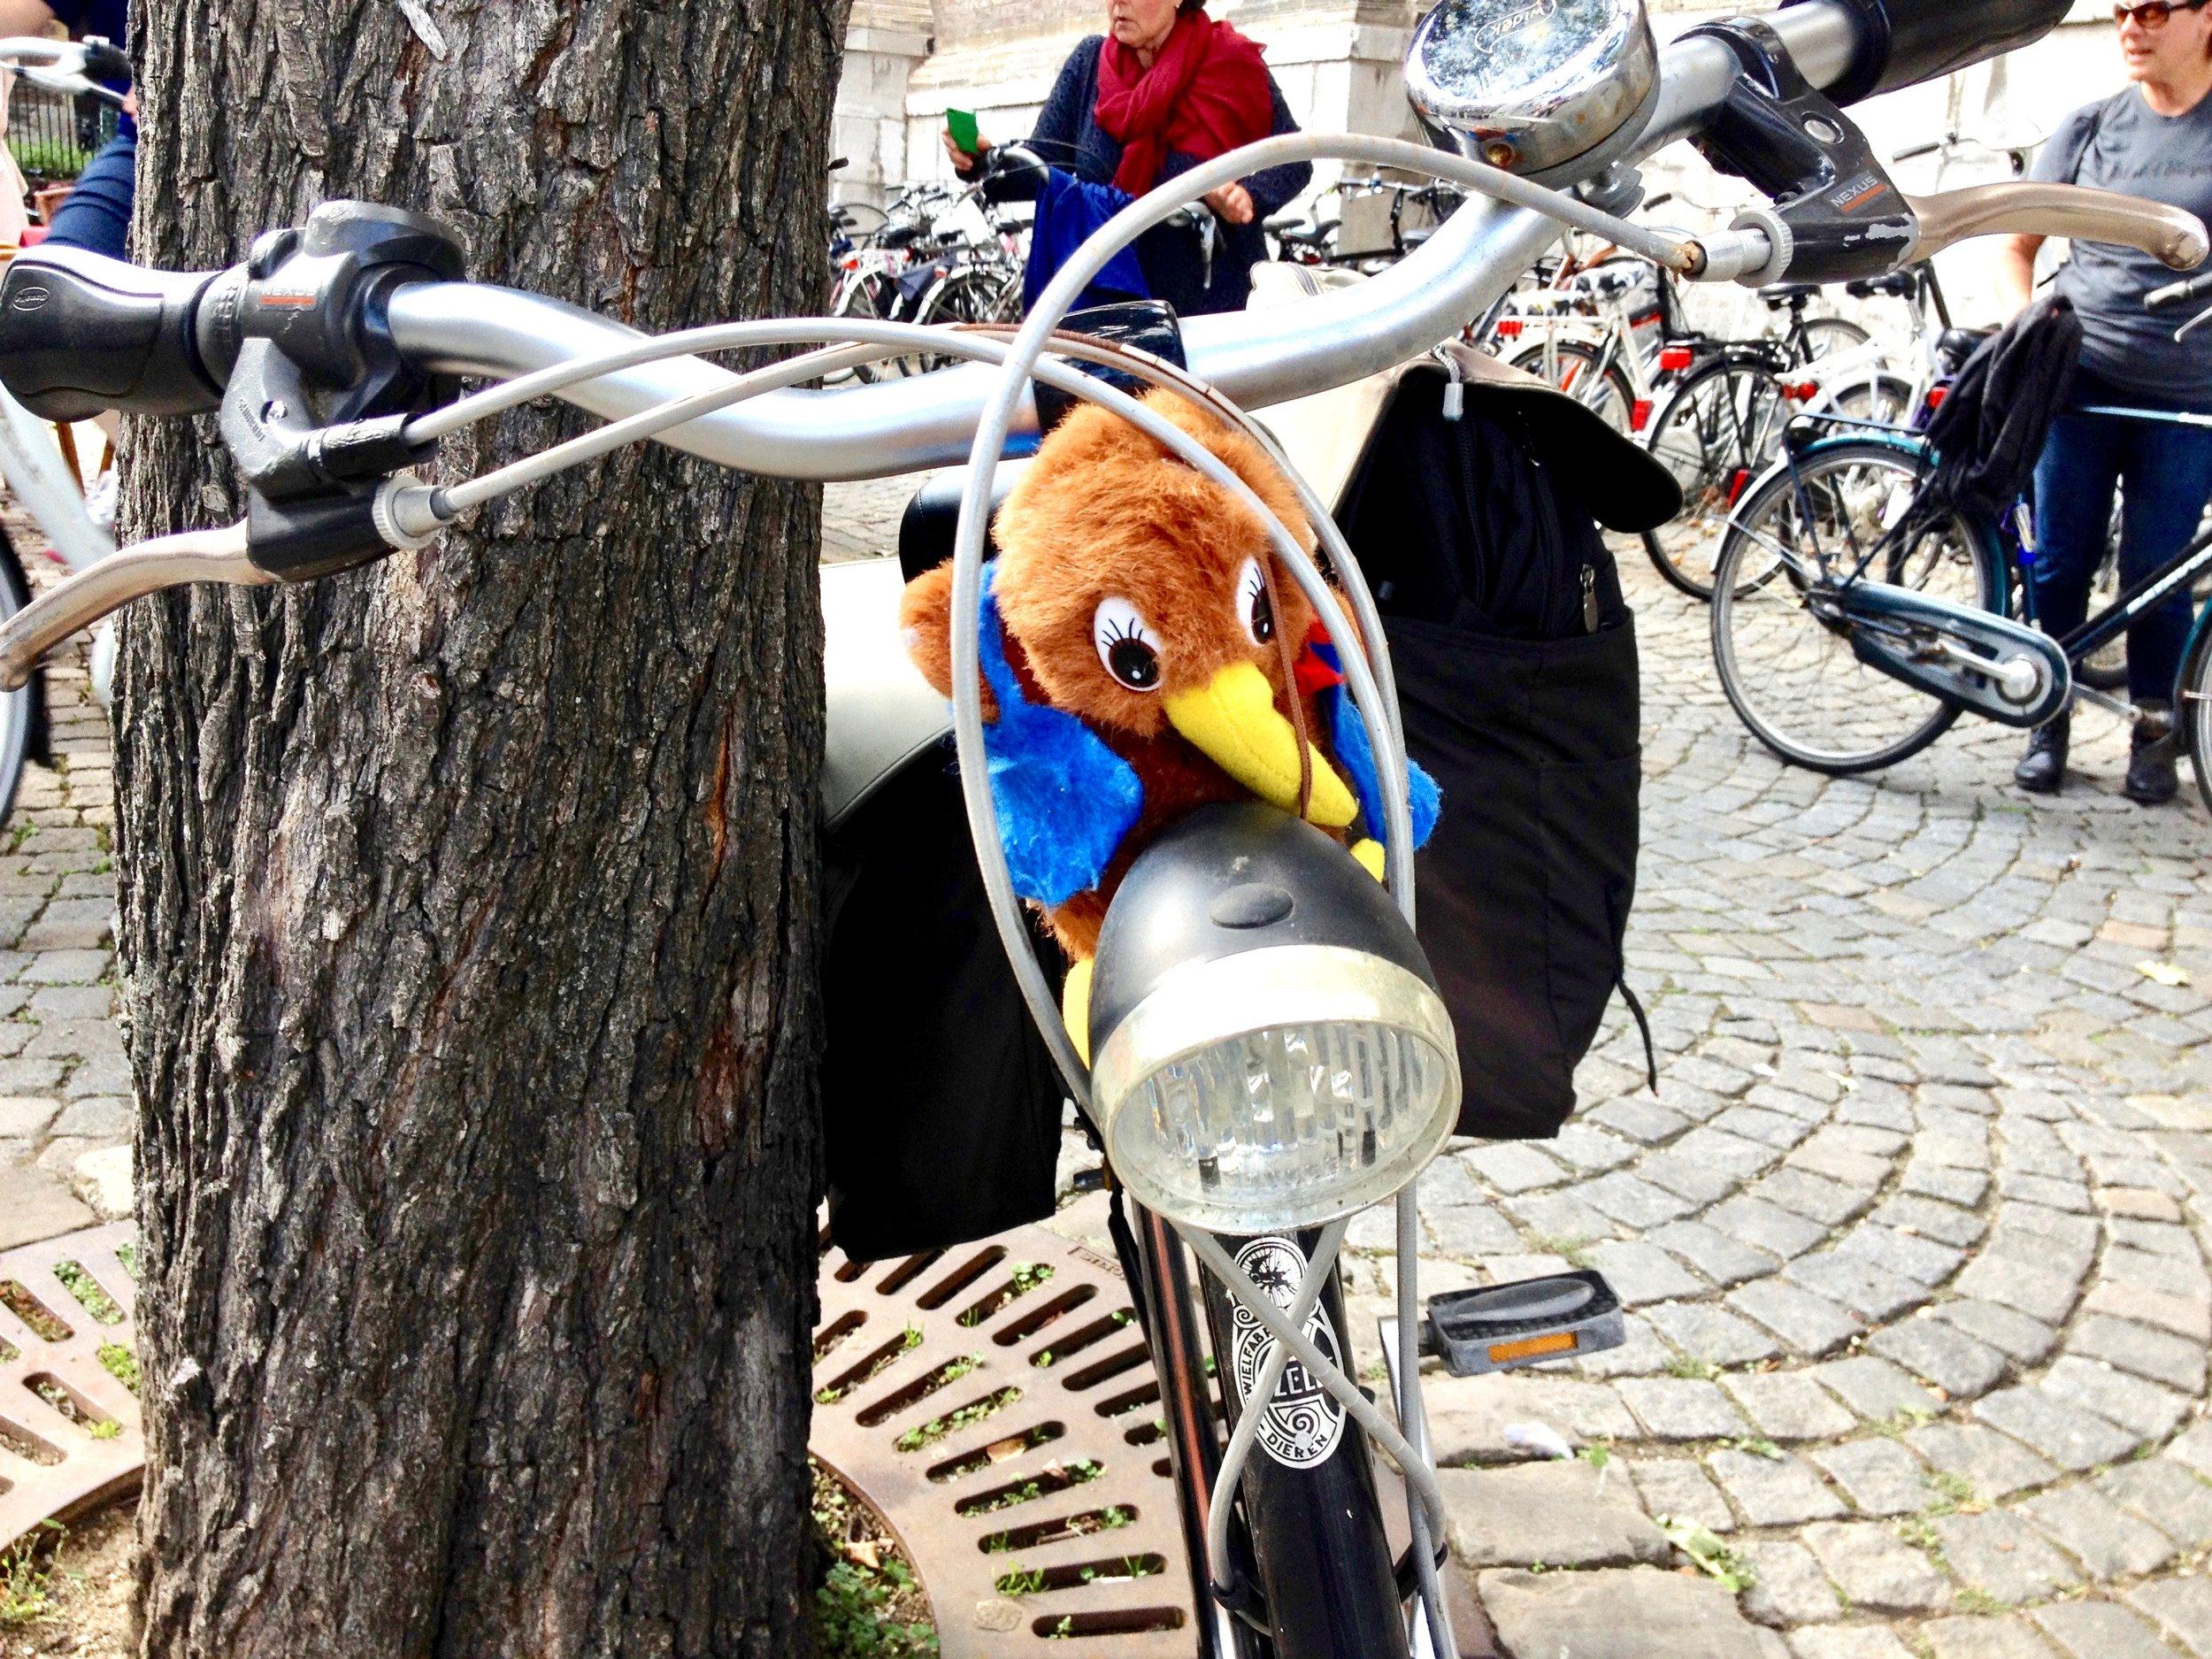 Kiwi-bicycle-dutch-netherlands.jpg